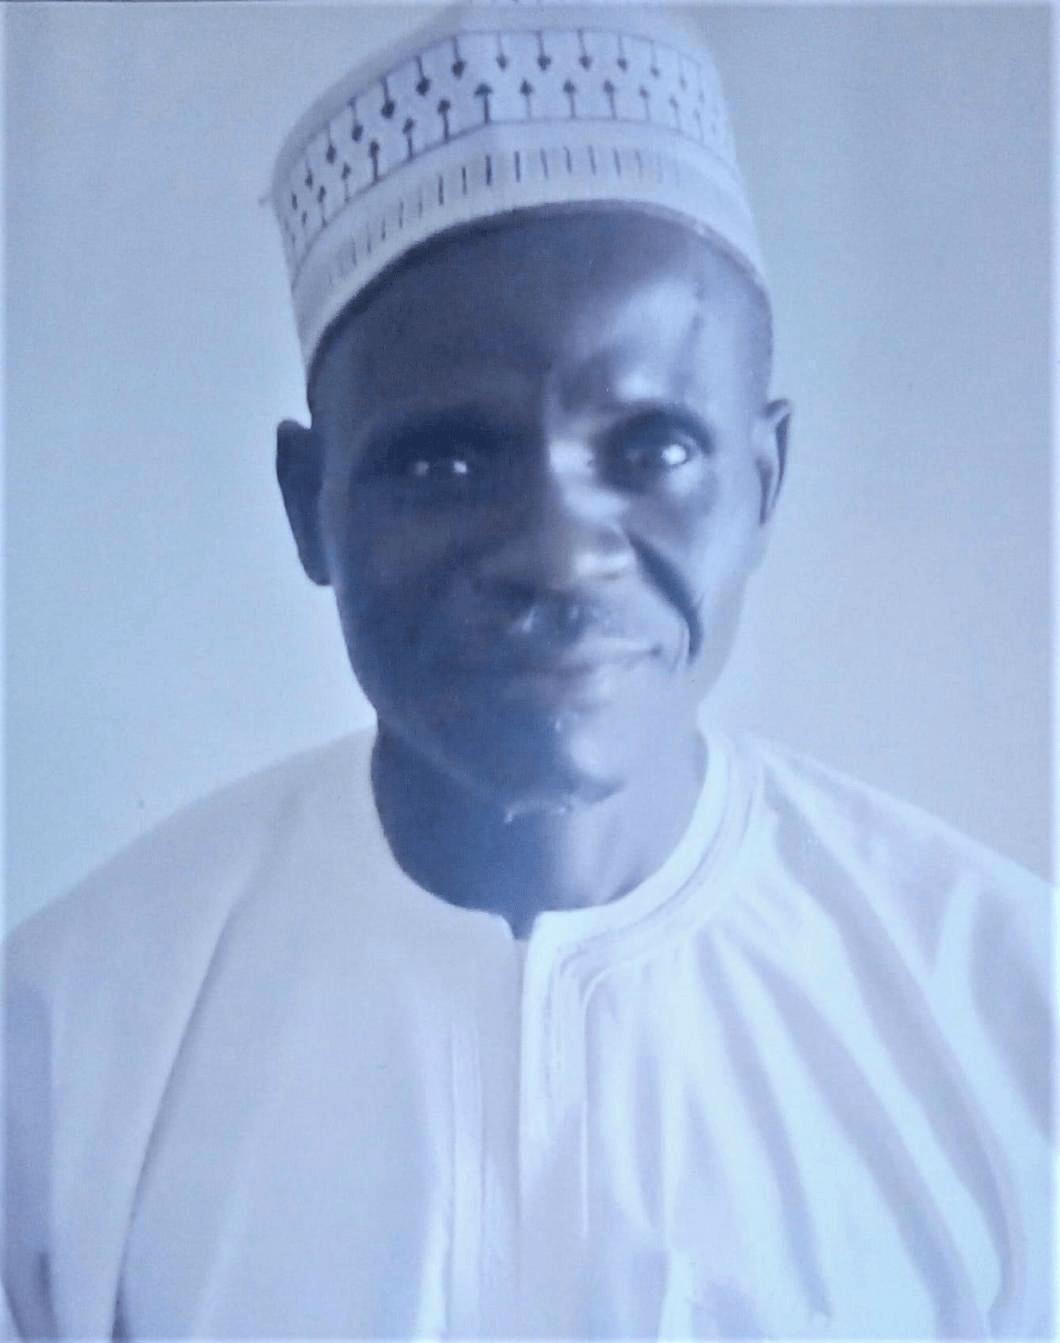 Church Elder Killed, Three Other Christians Abducted by Fulani Herdsmen in Northwest Nigeria